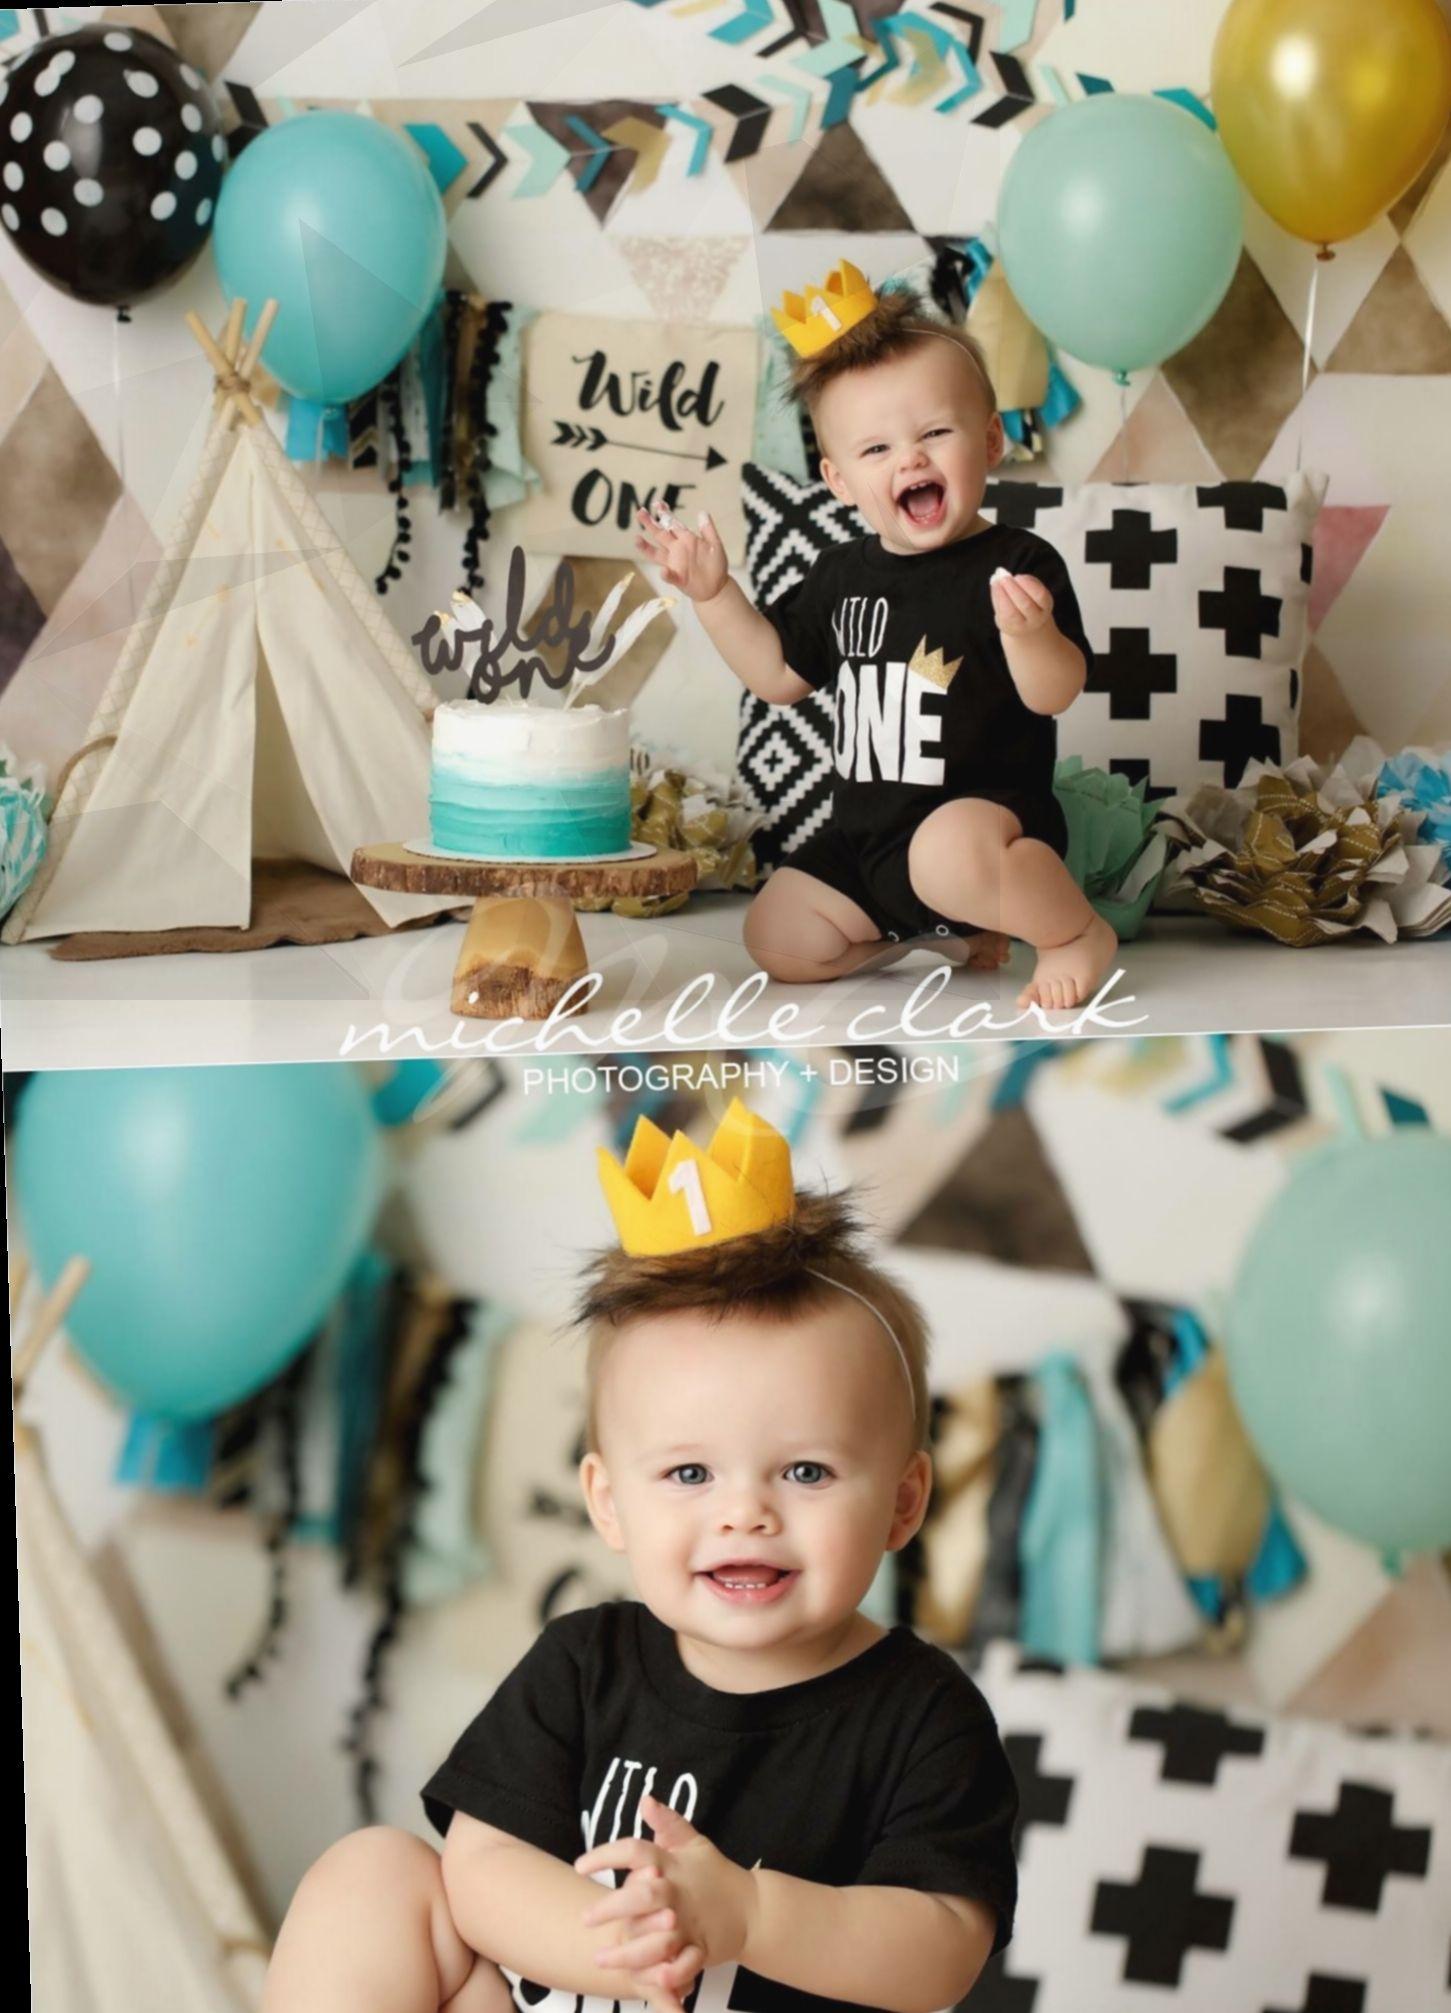 Birthday ideas photoshoot party gift happy baby boy